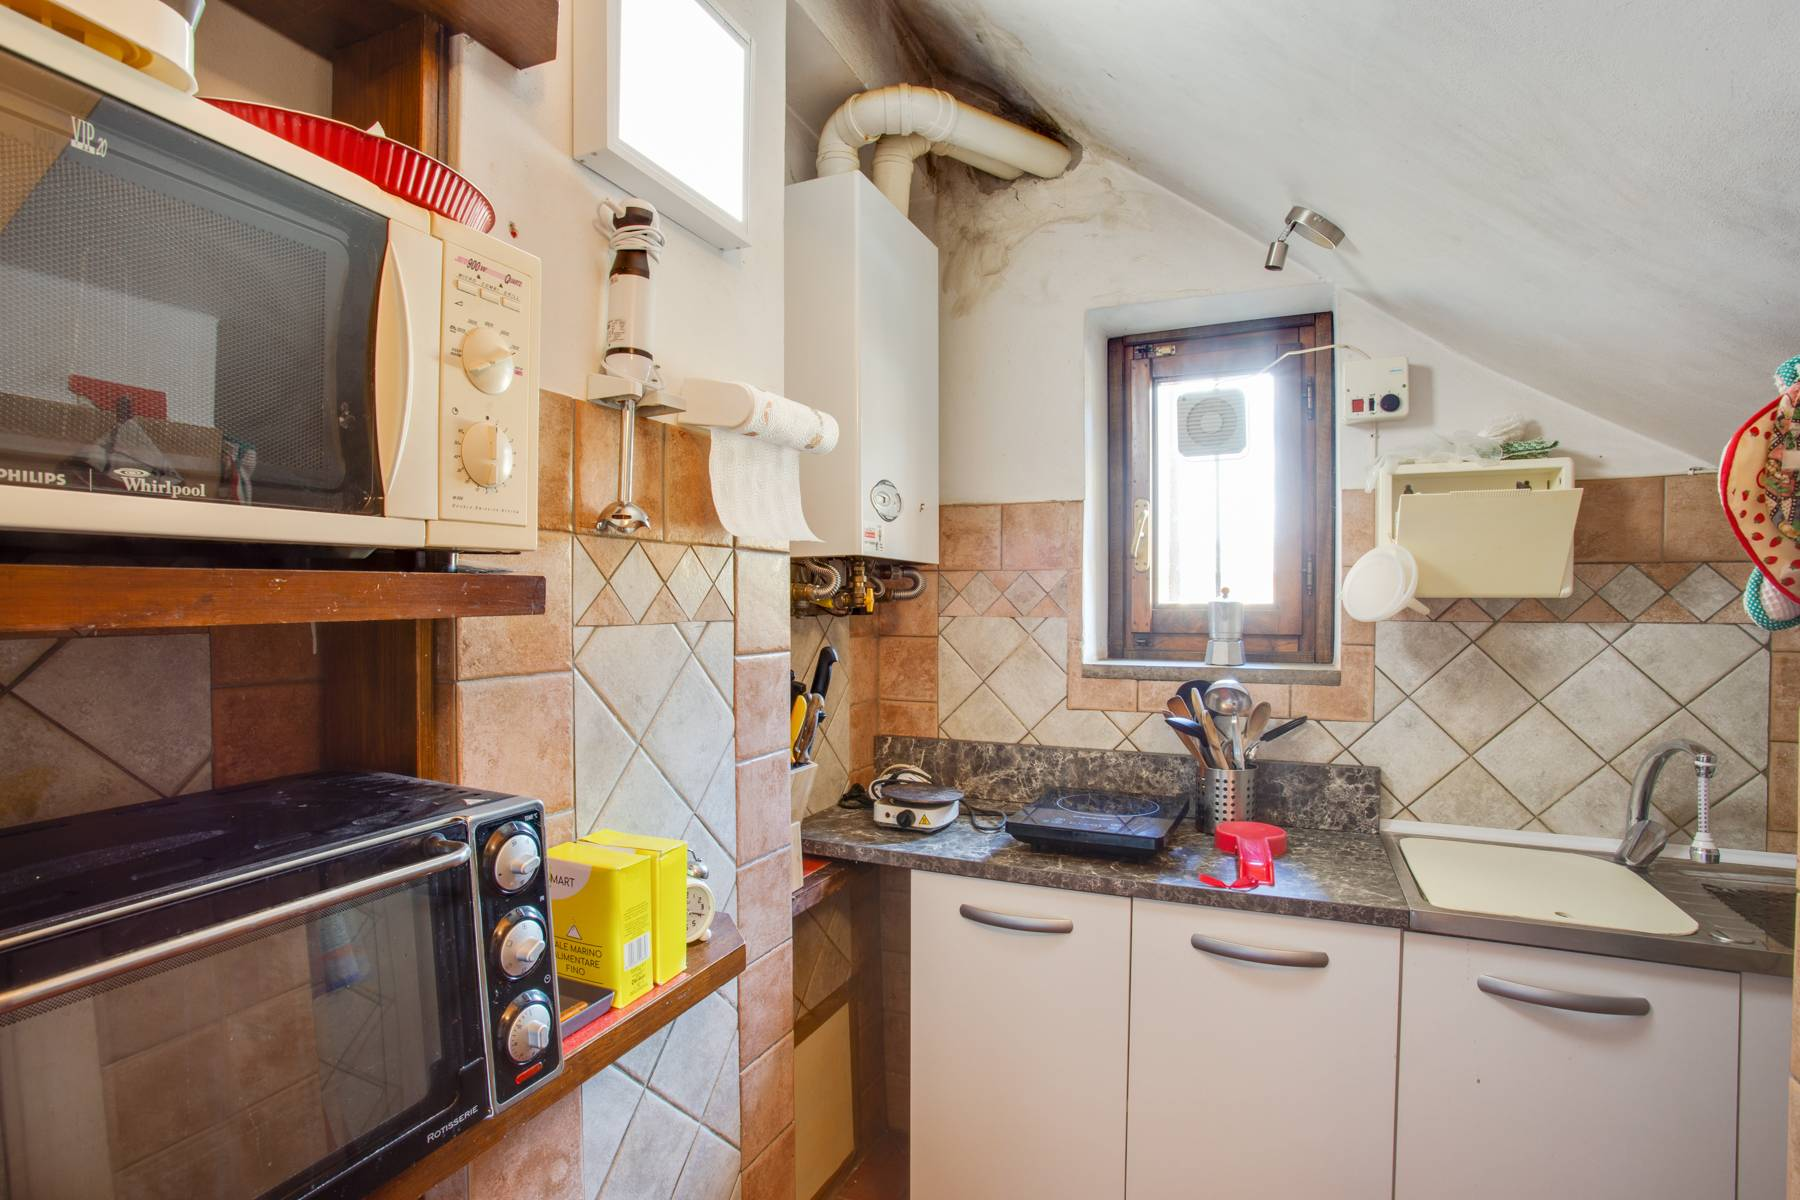 Appartamento in Vendita a Scandicci: 5 locali, 140 mq - Foto 6